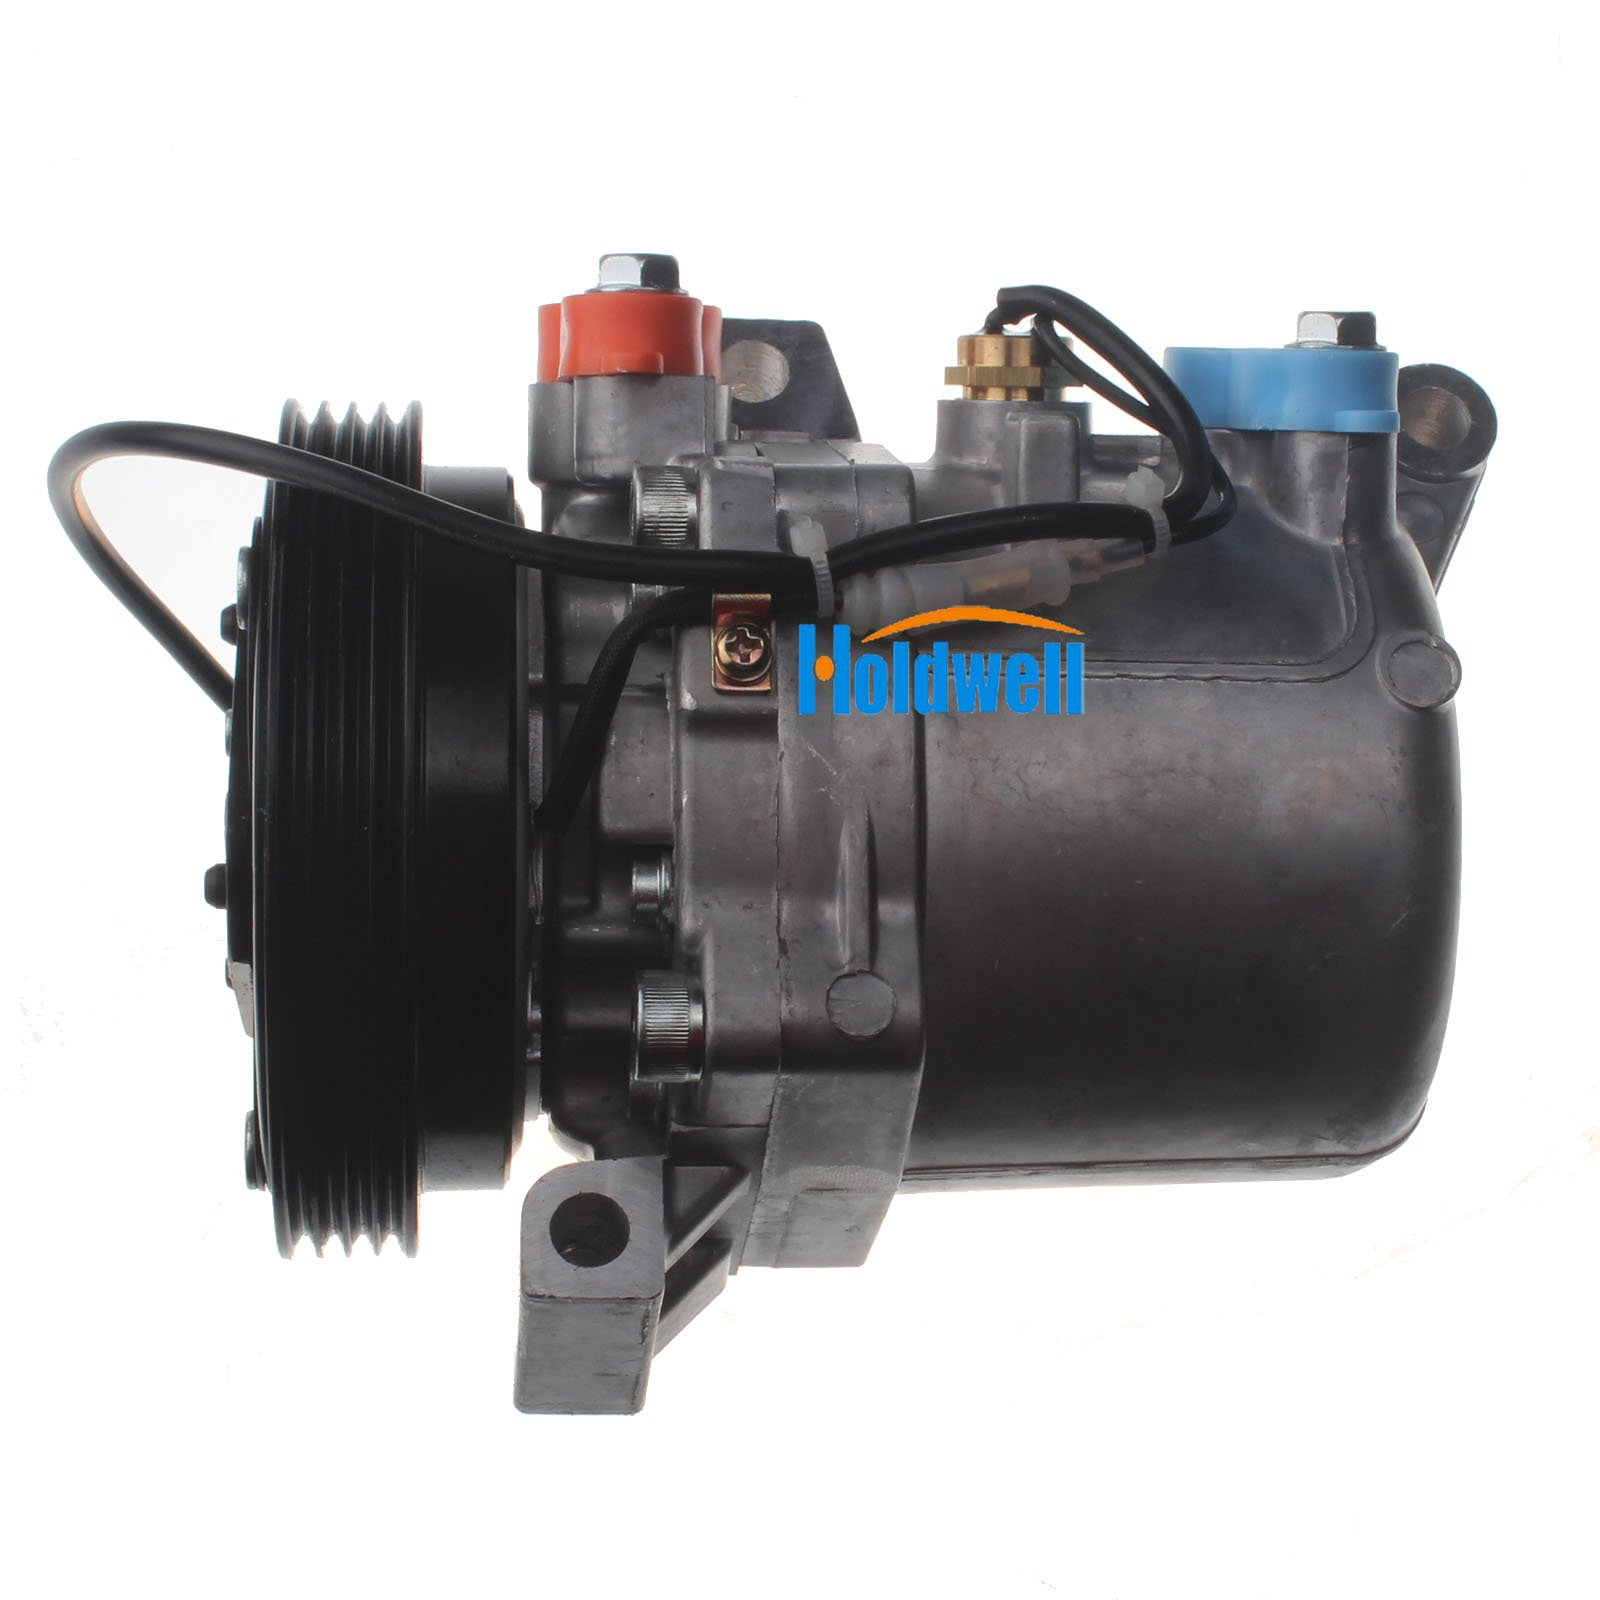 Holdwell Auto AC Compressor 95201-77GB2 9520177GB2 for Suzuki Jimny Seiko Seiki SS07LK10 by Holdwell (Image #2)